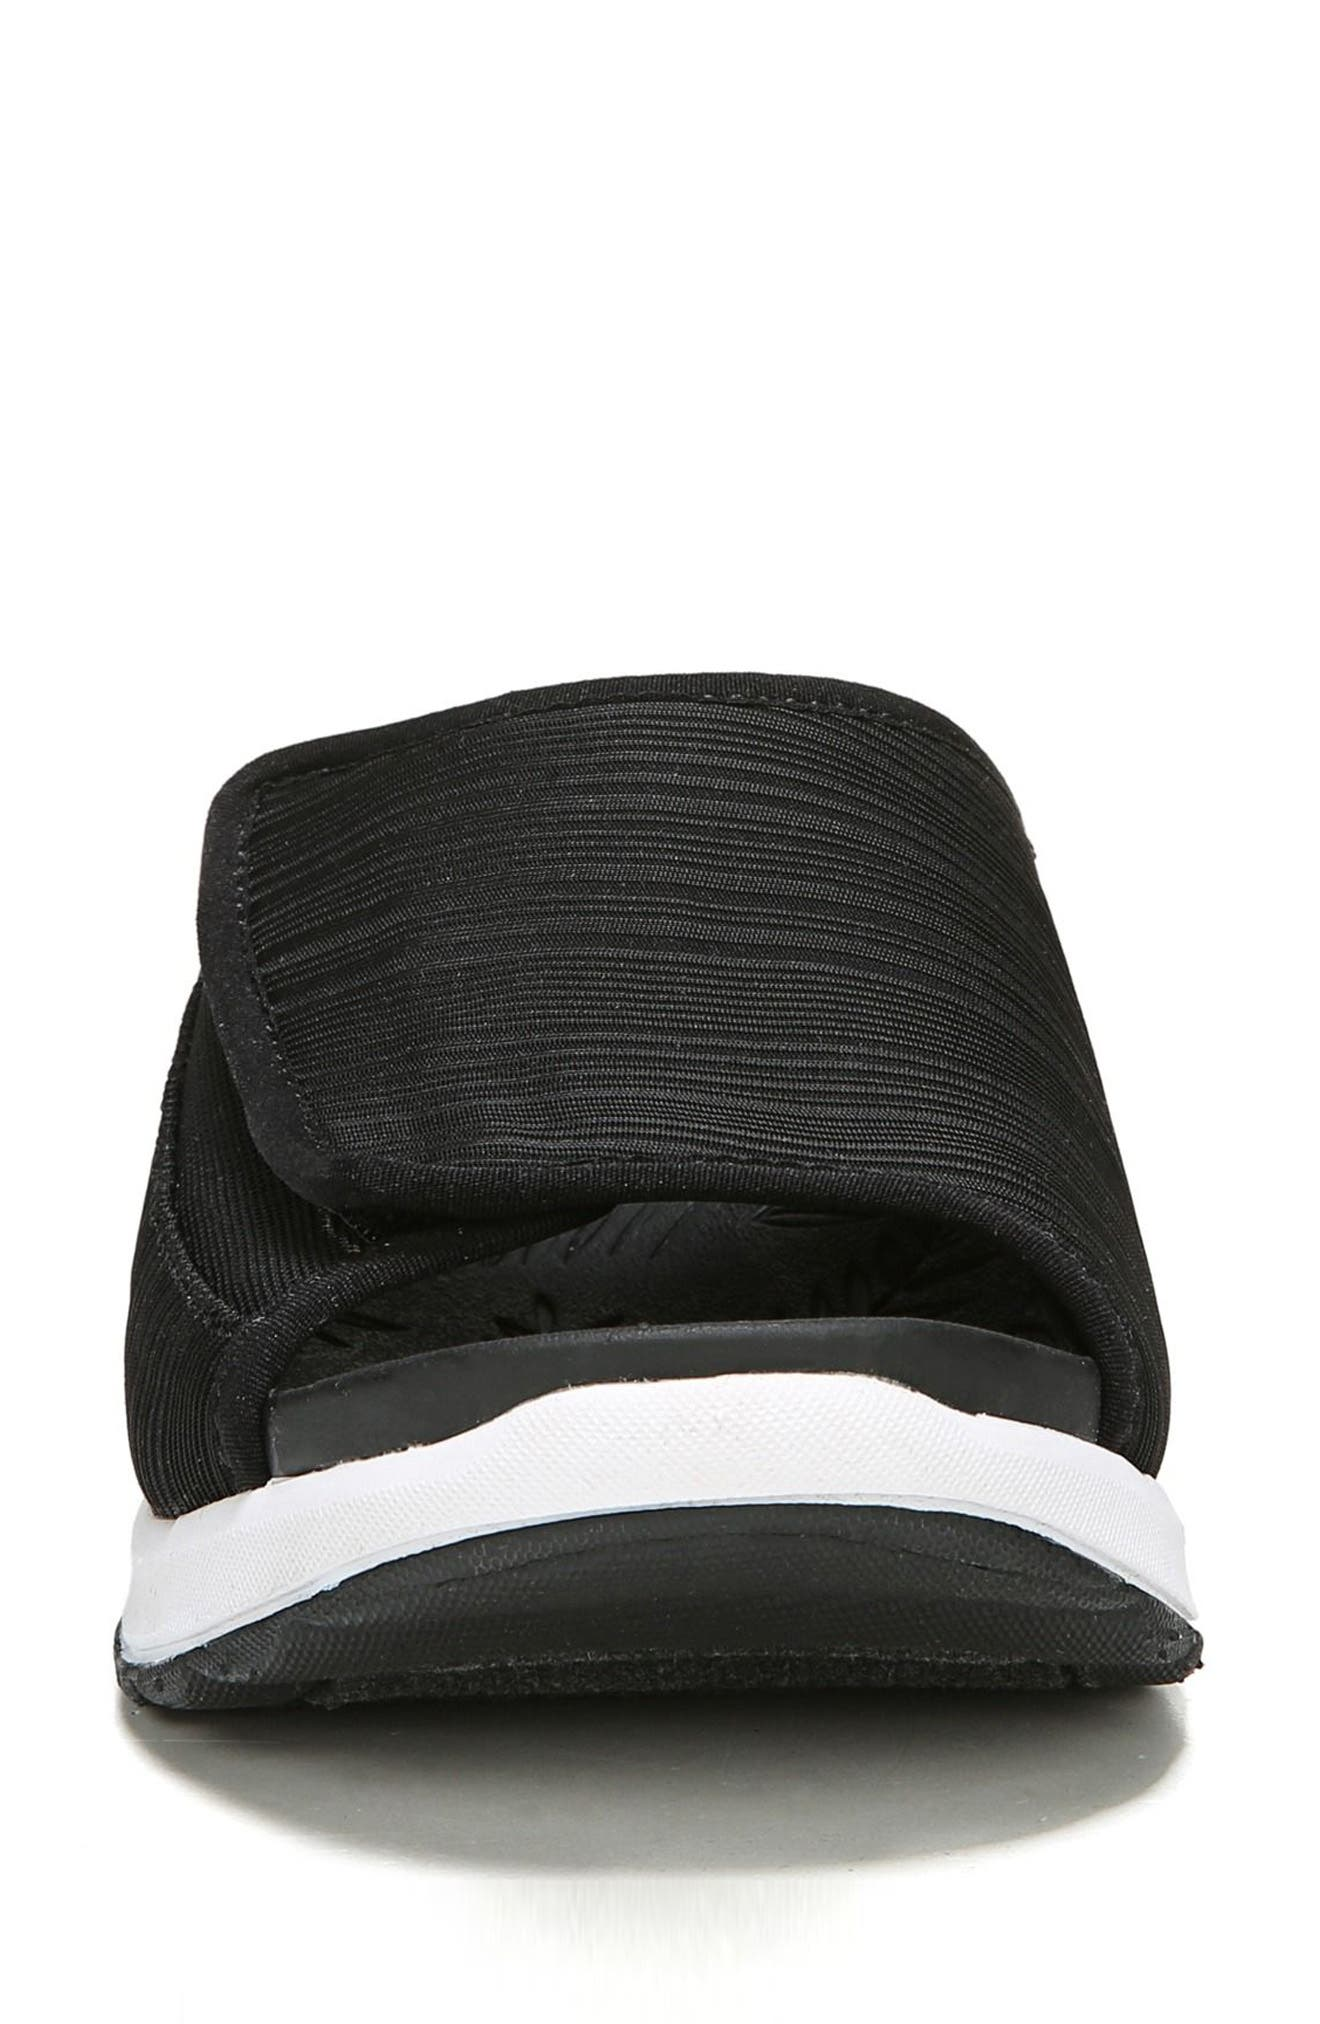 Galaxy Slide Sandal,                             Alternate thumbnail 4, color,                             BLACK FABRIC